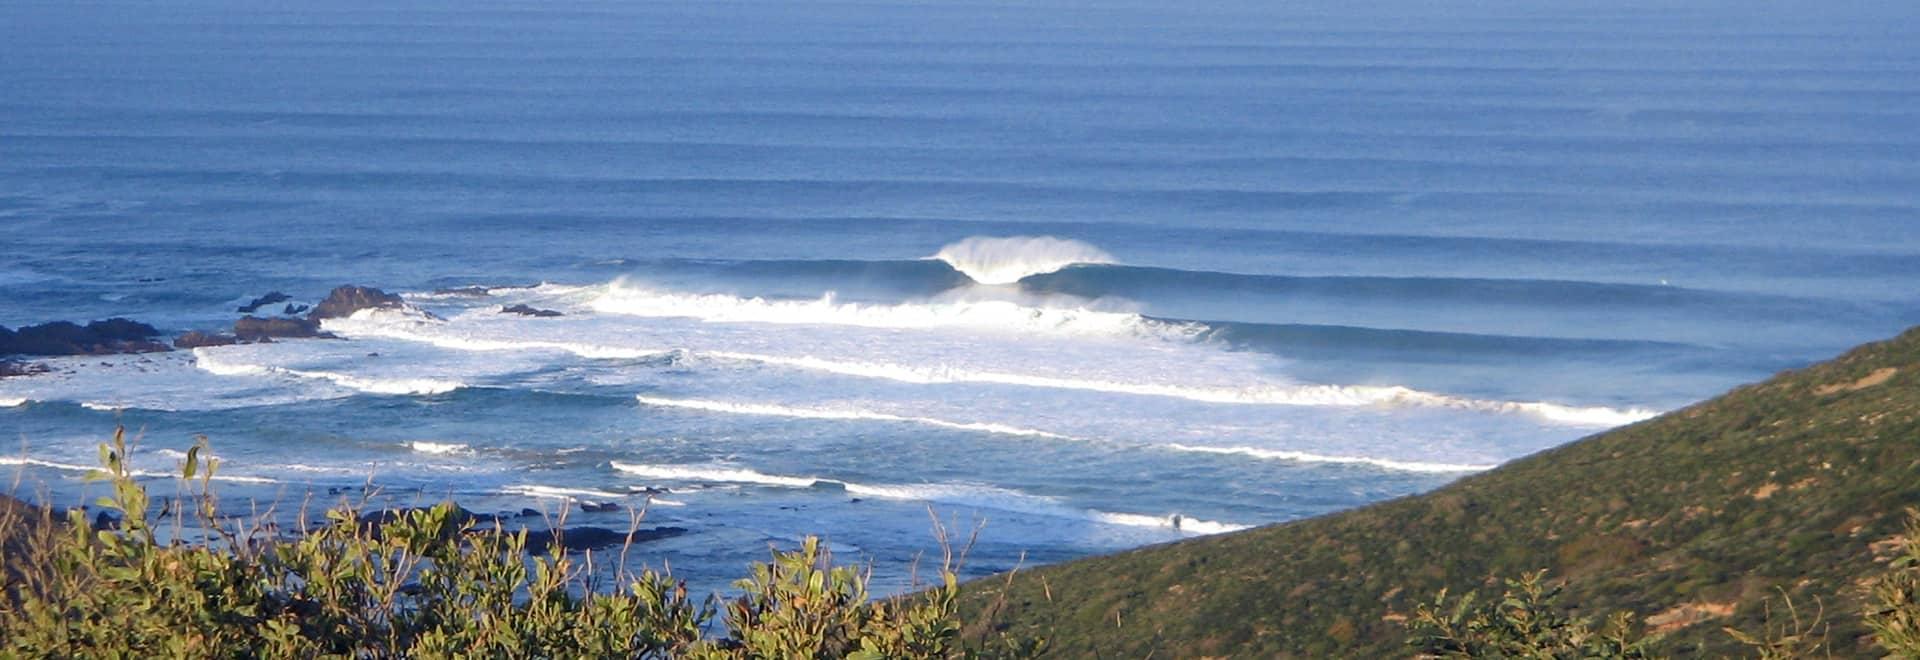 algarve surf guiding secret spot